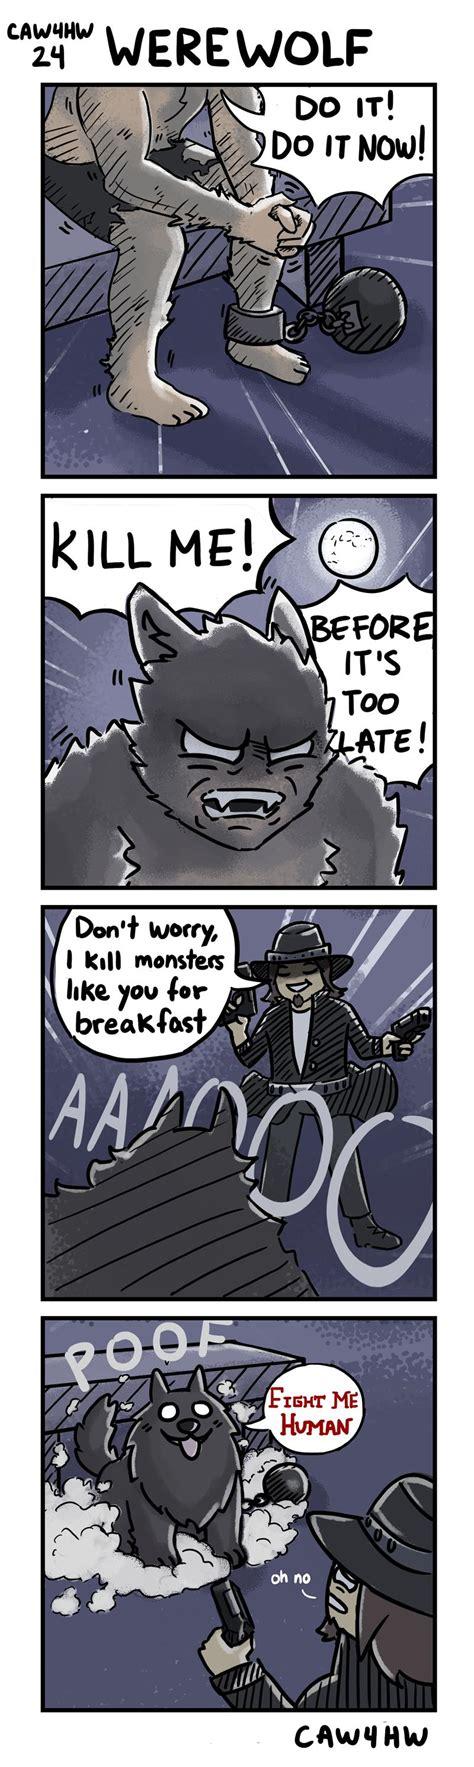 werewolf comics oc funny redd cartoons humor expand jokes